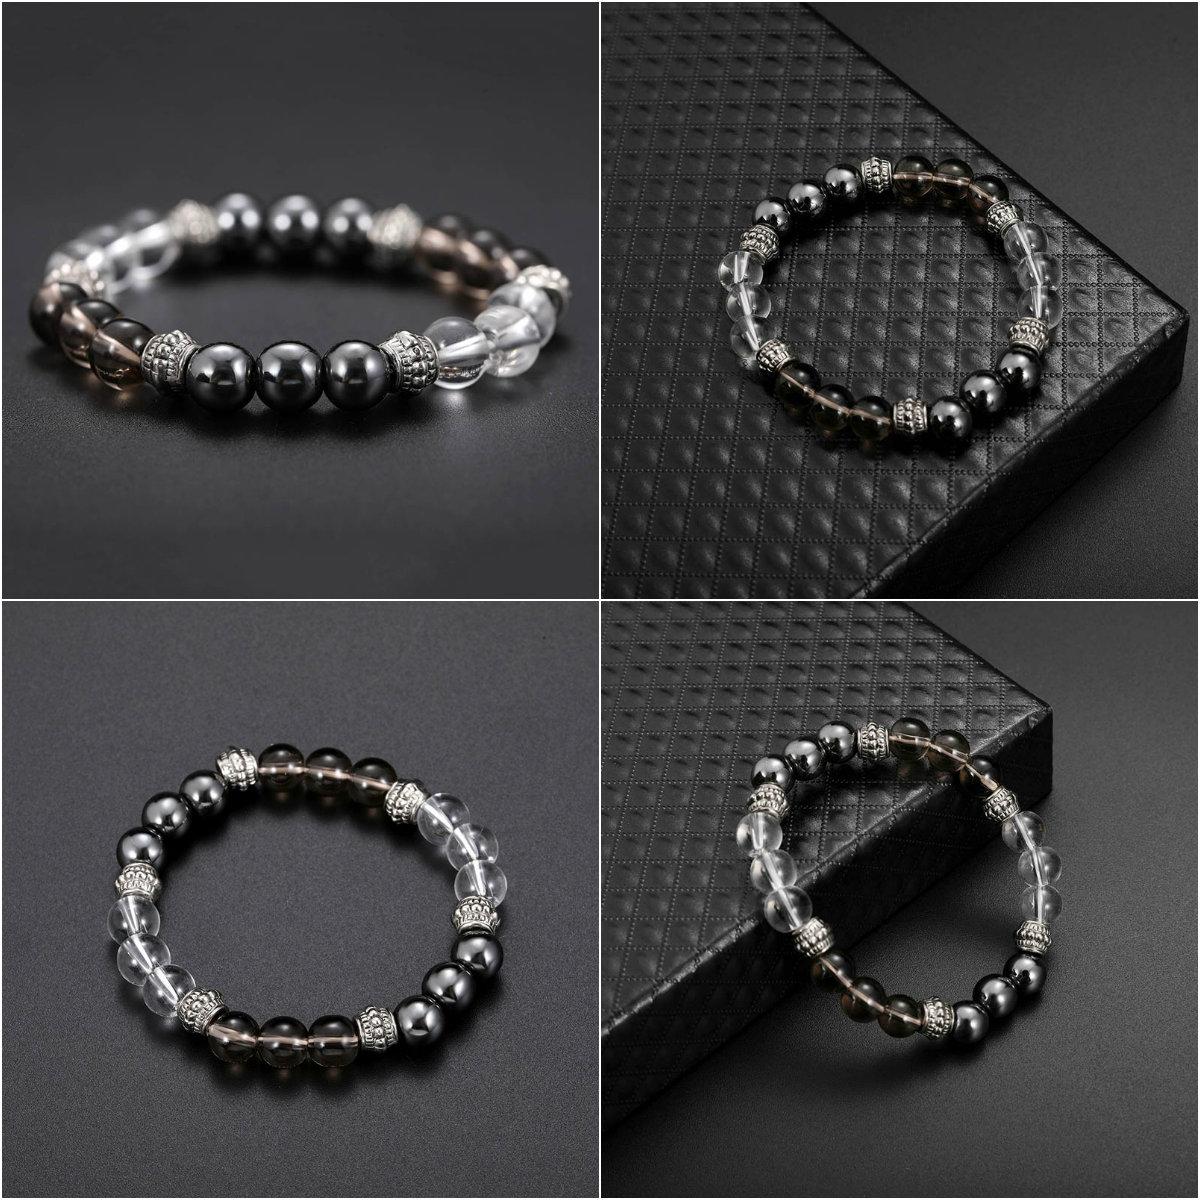 Cool Magnetic Bracelet Beads Hematite Stone Therapy Health Care Magnet Hematite Beads Bracelet Slimming Product